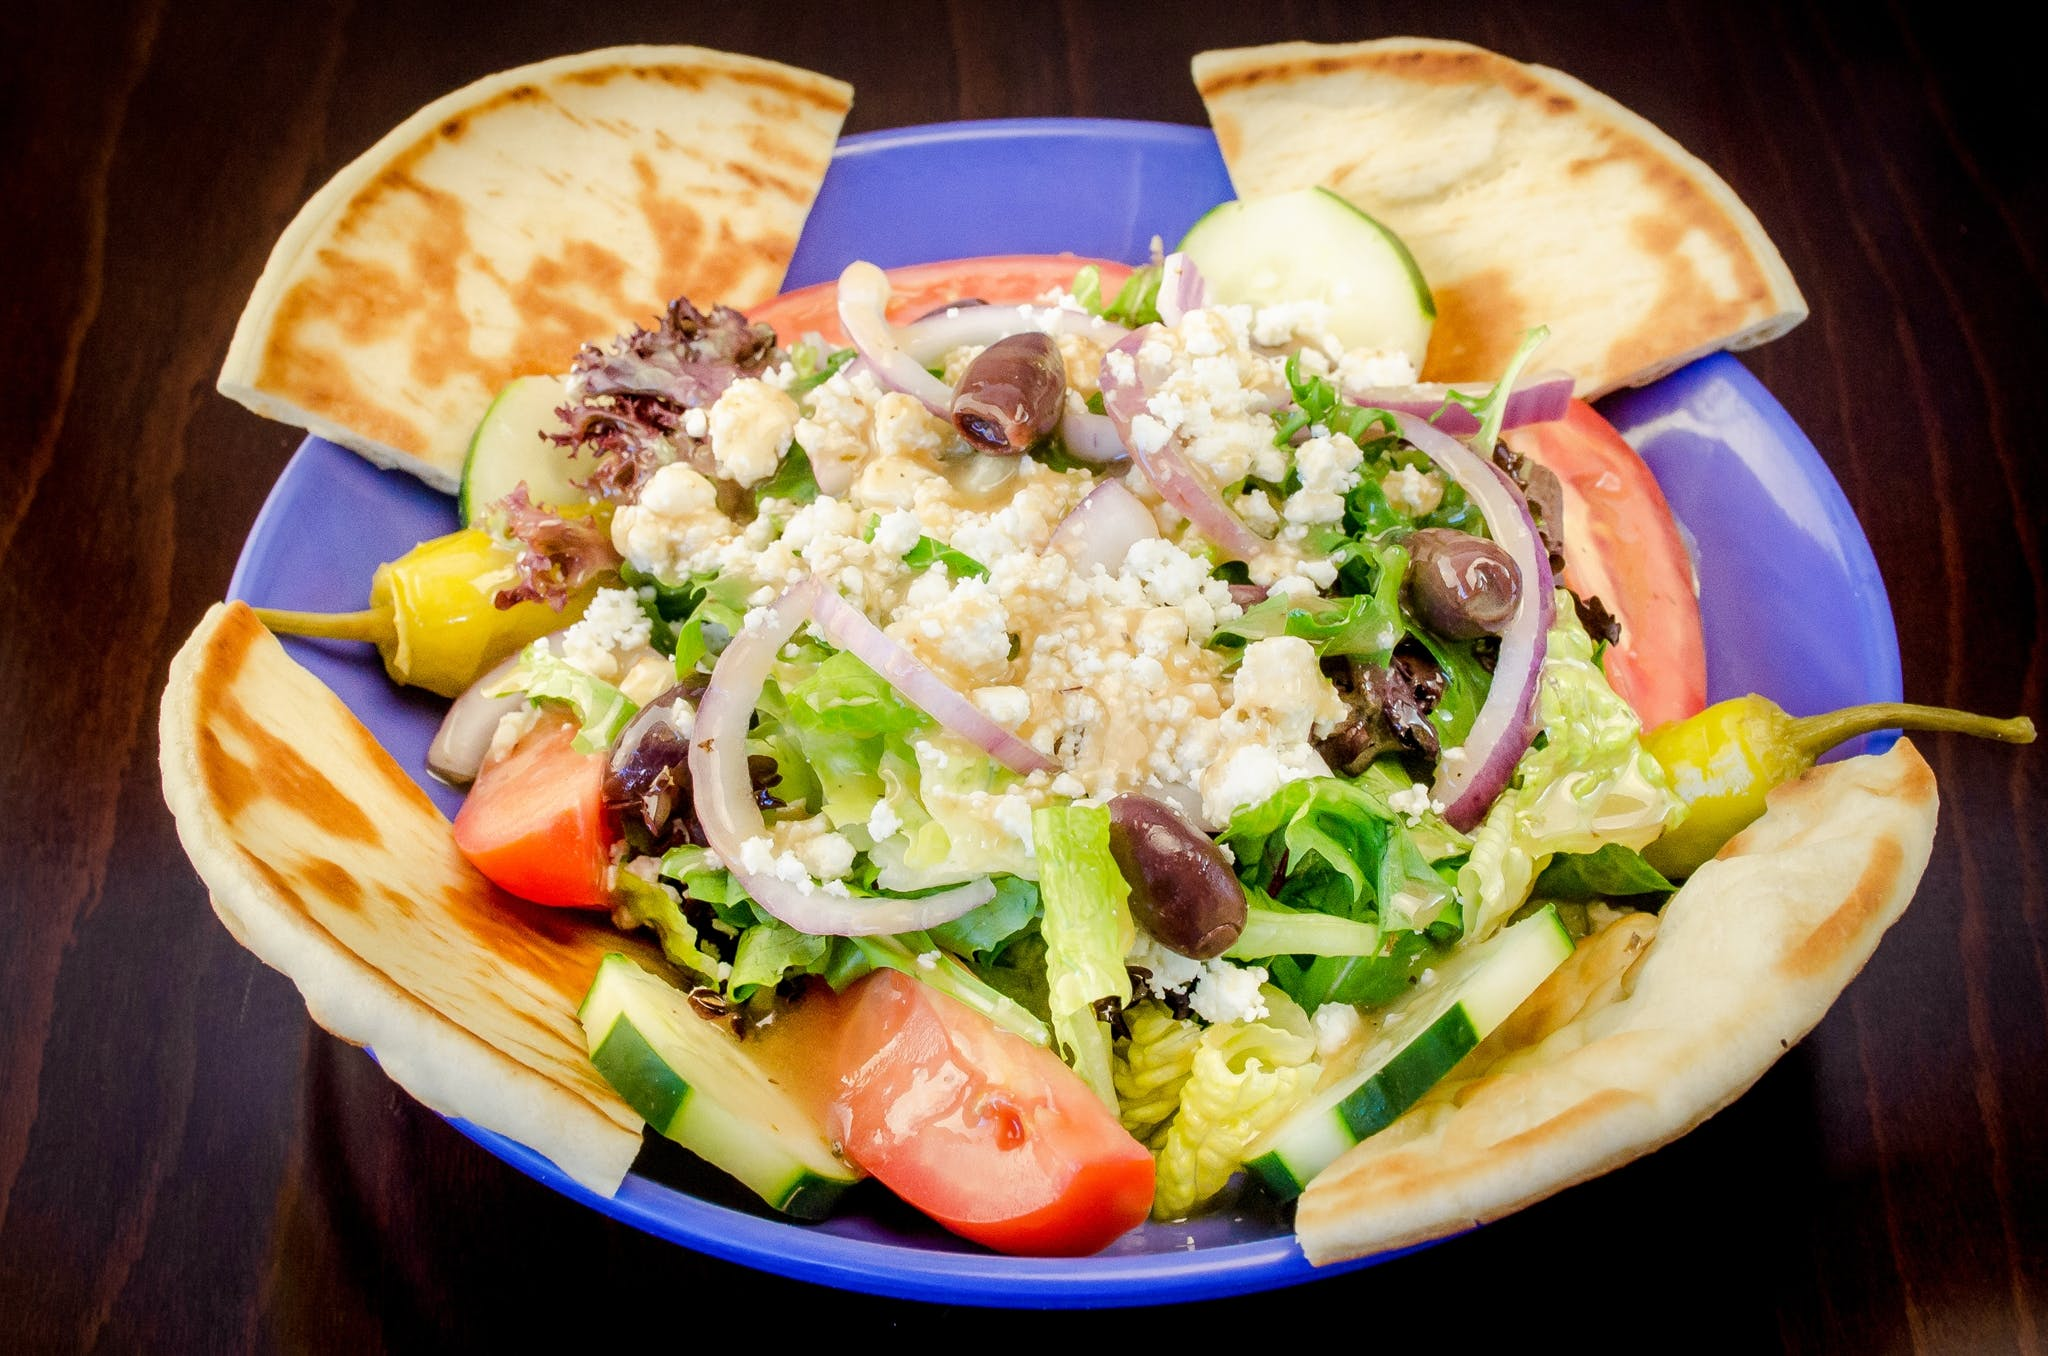 Classic Greek Salad from Freska Mediterranean Grill in Middleton, WI